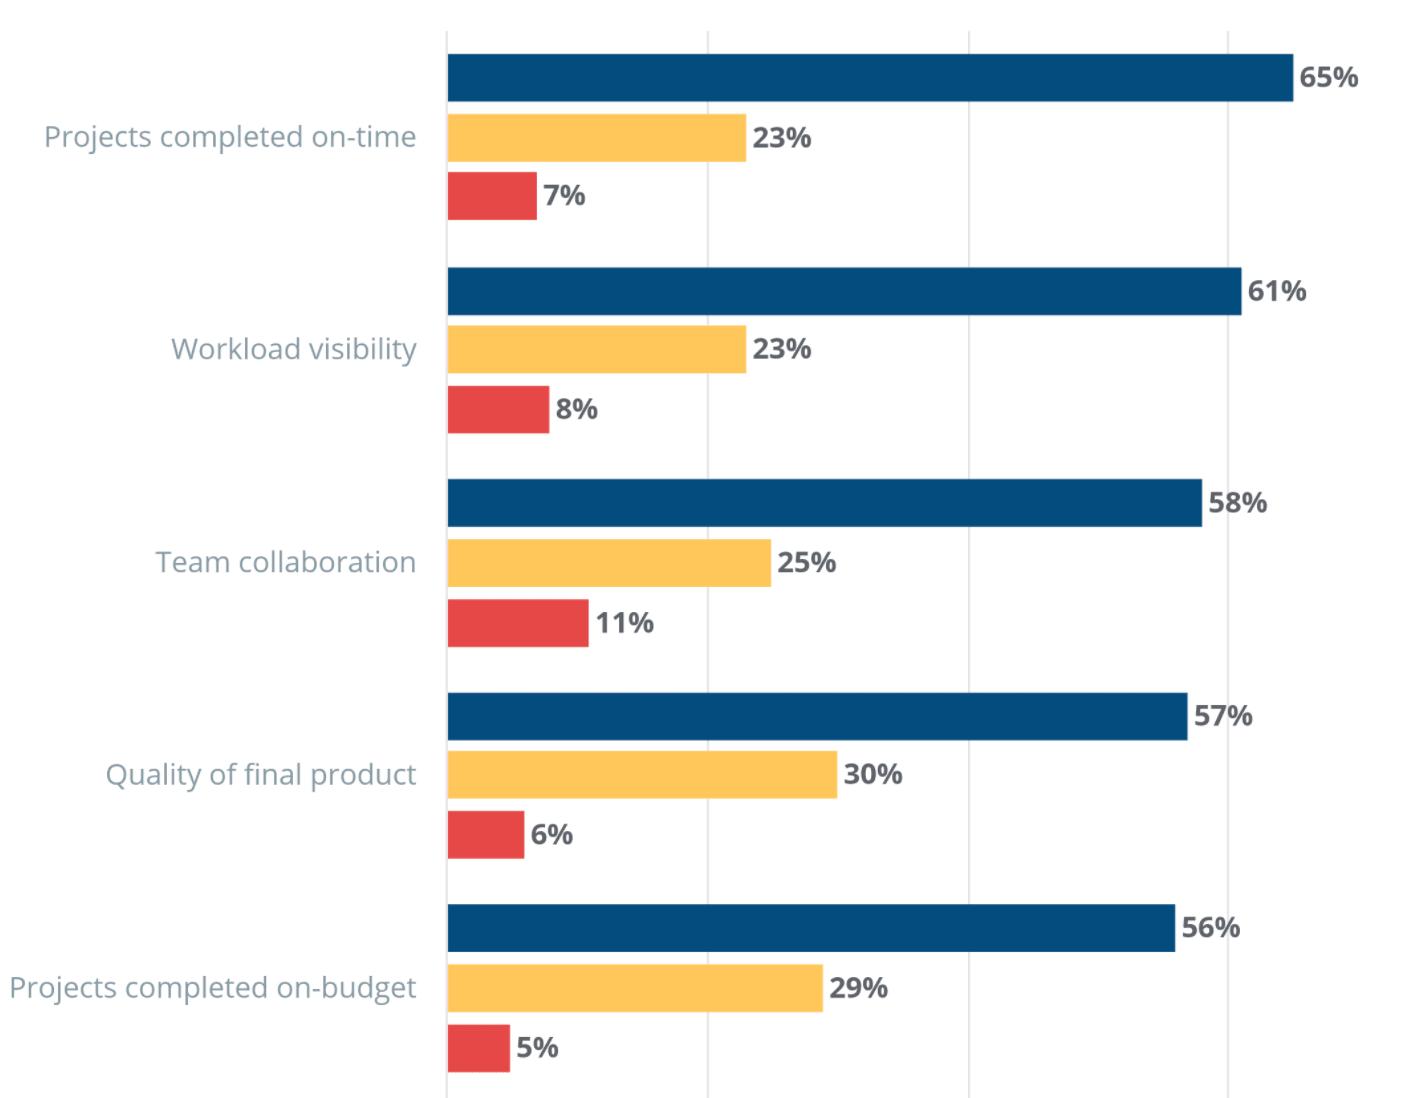 Design project management software statistics